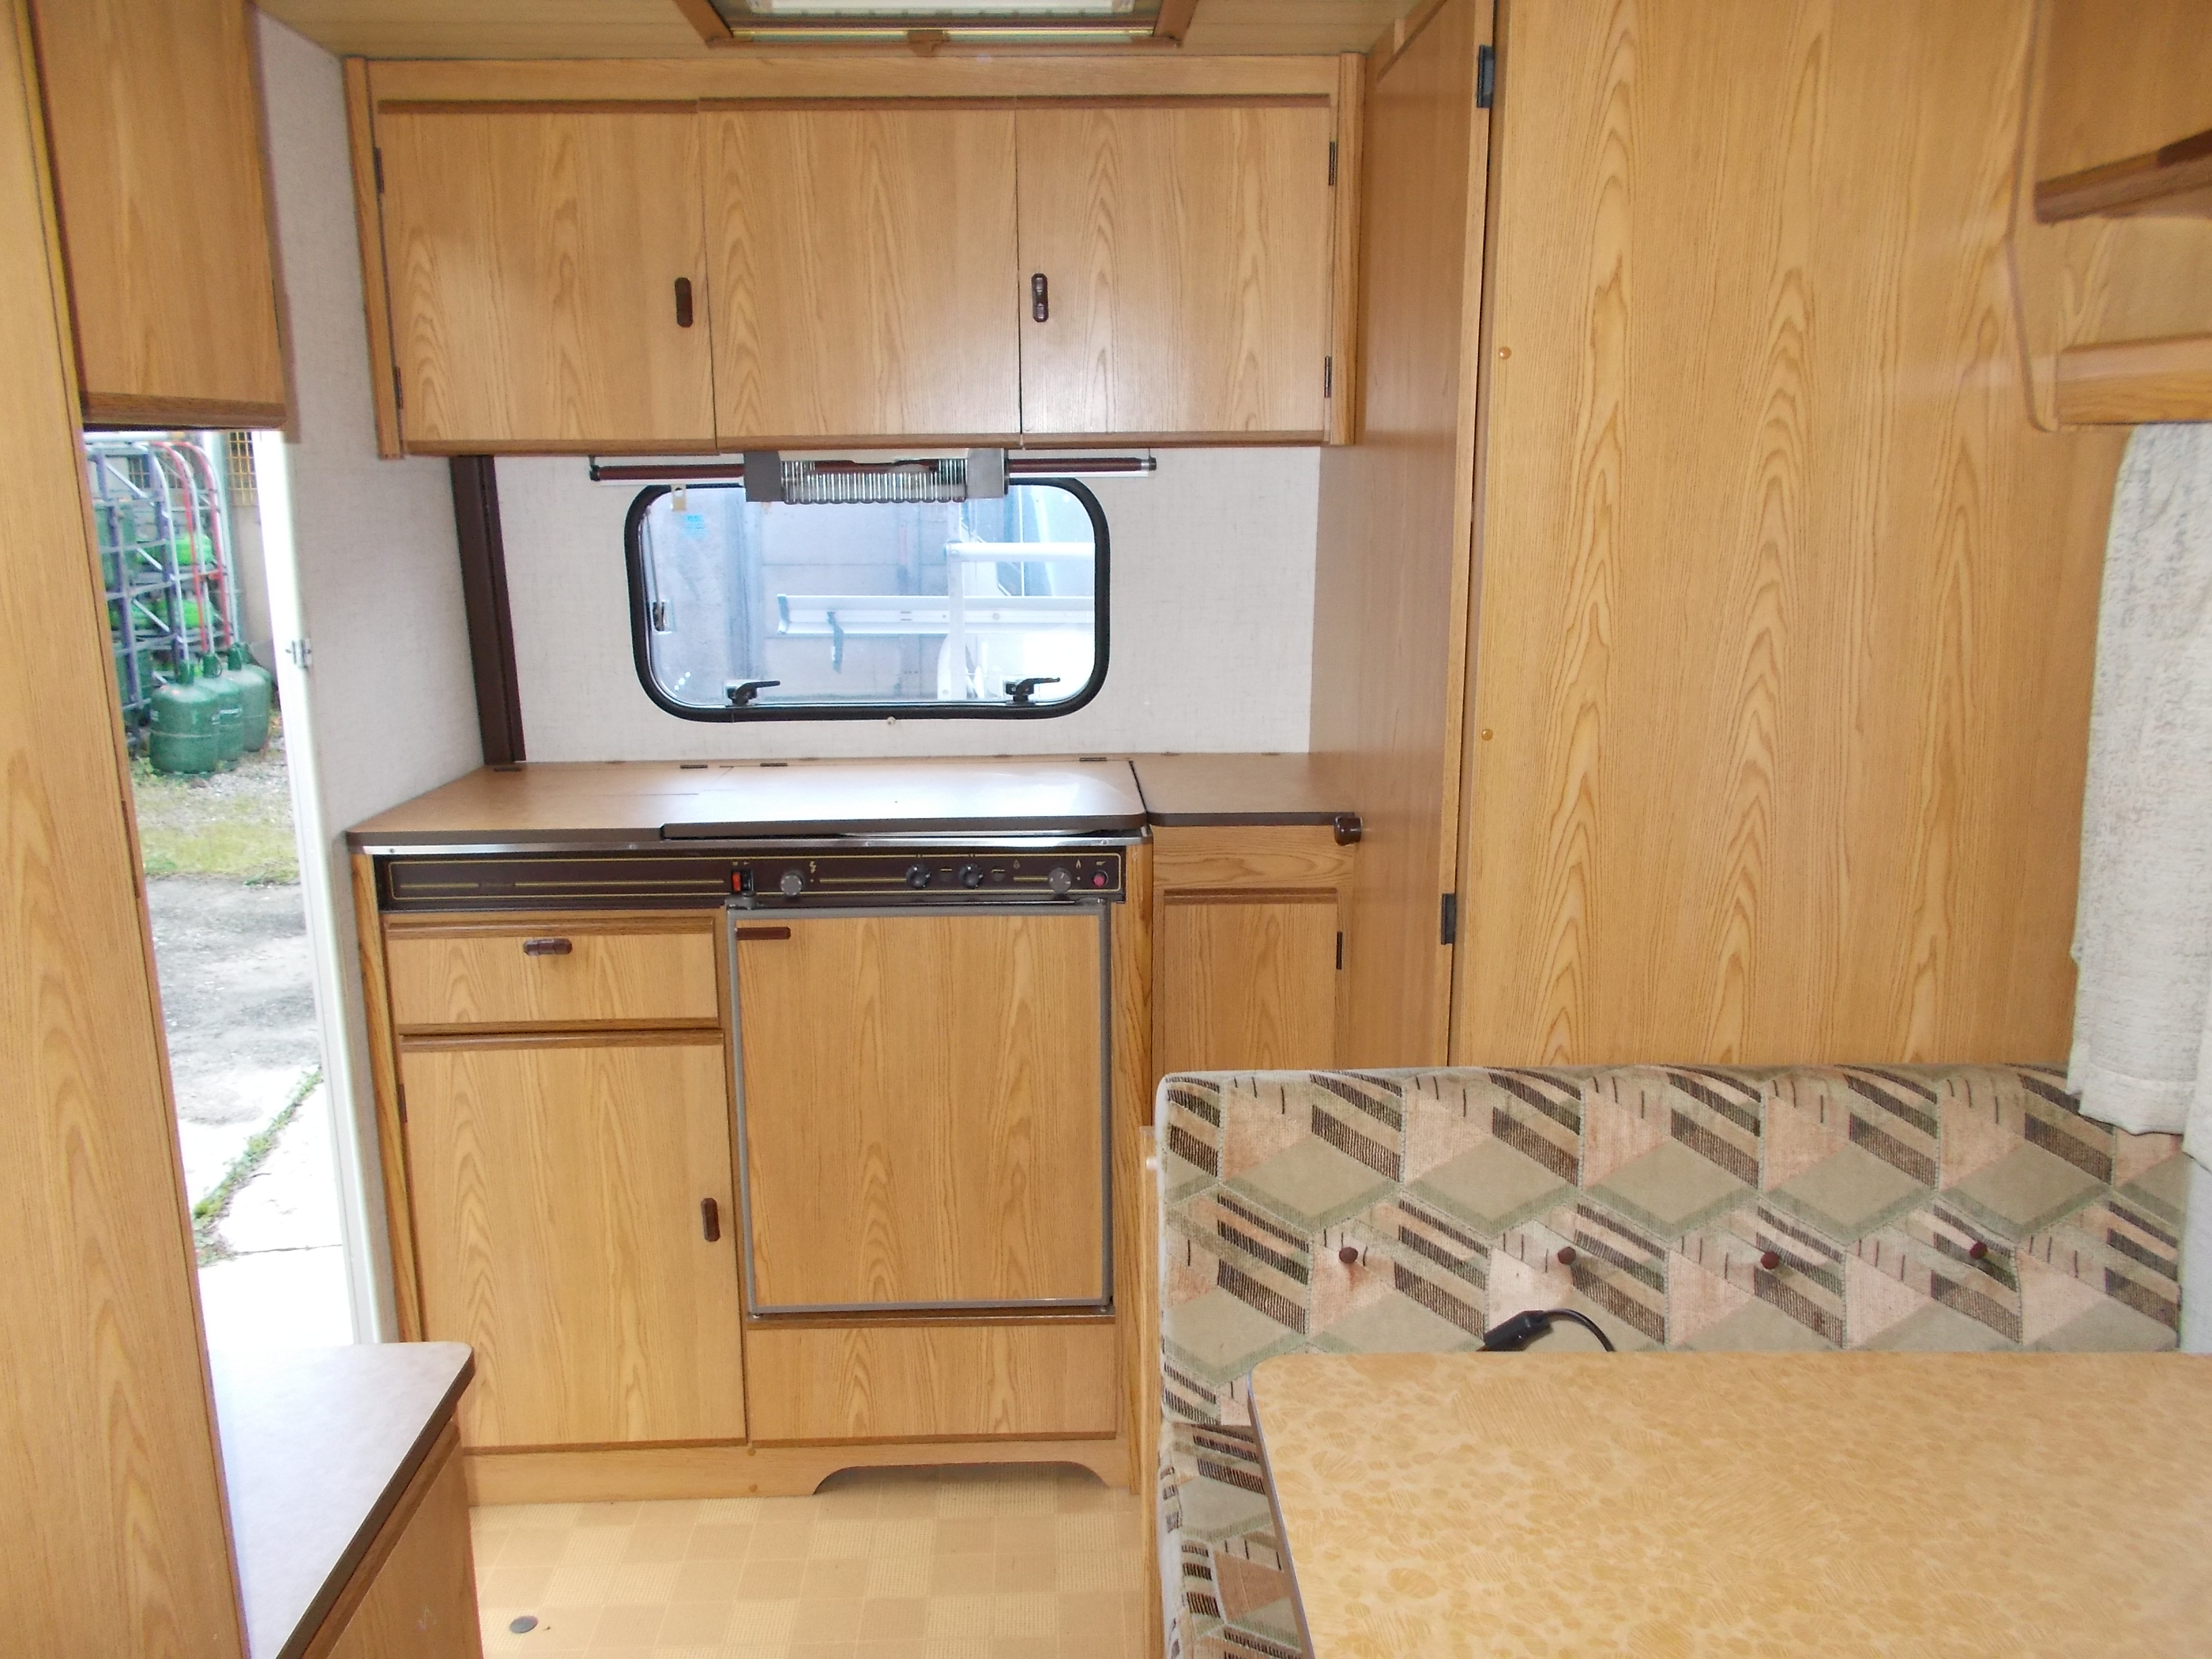 montargis caravanes burstner club 400 ts annonces occasion. Black Bedroom Furniture Sets. Home Design Ideas